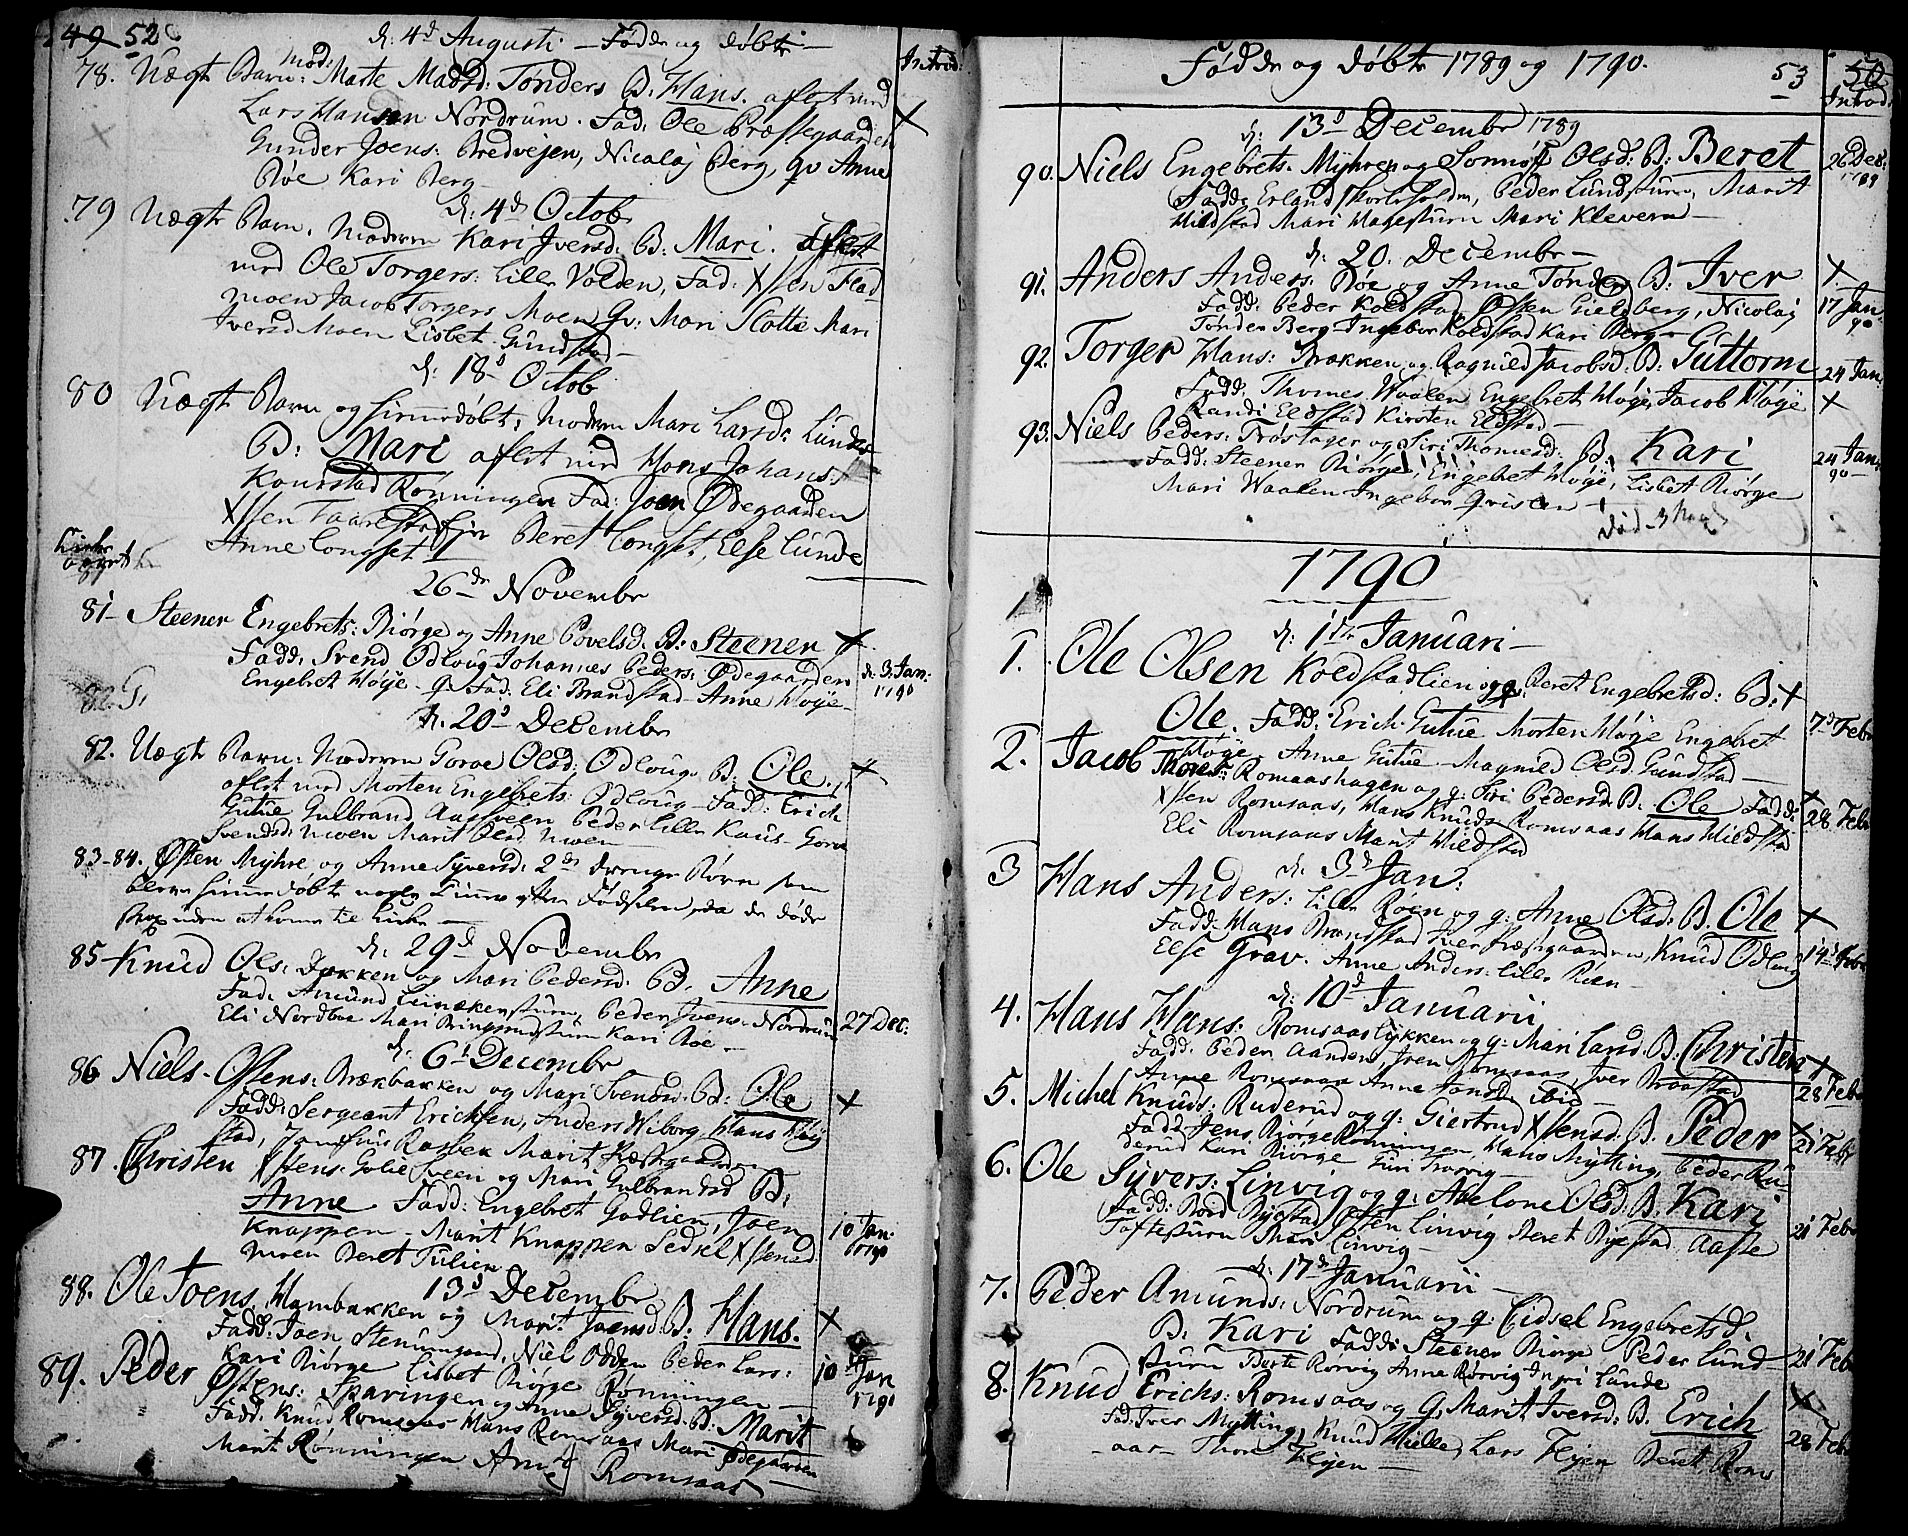 SAH, Ringebu prestekontor, Ministerialbok nr. 3, 1781-1820, s. 52-53